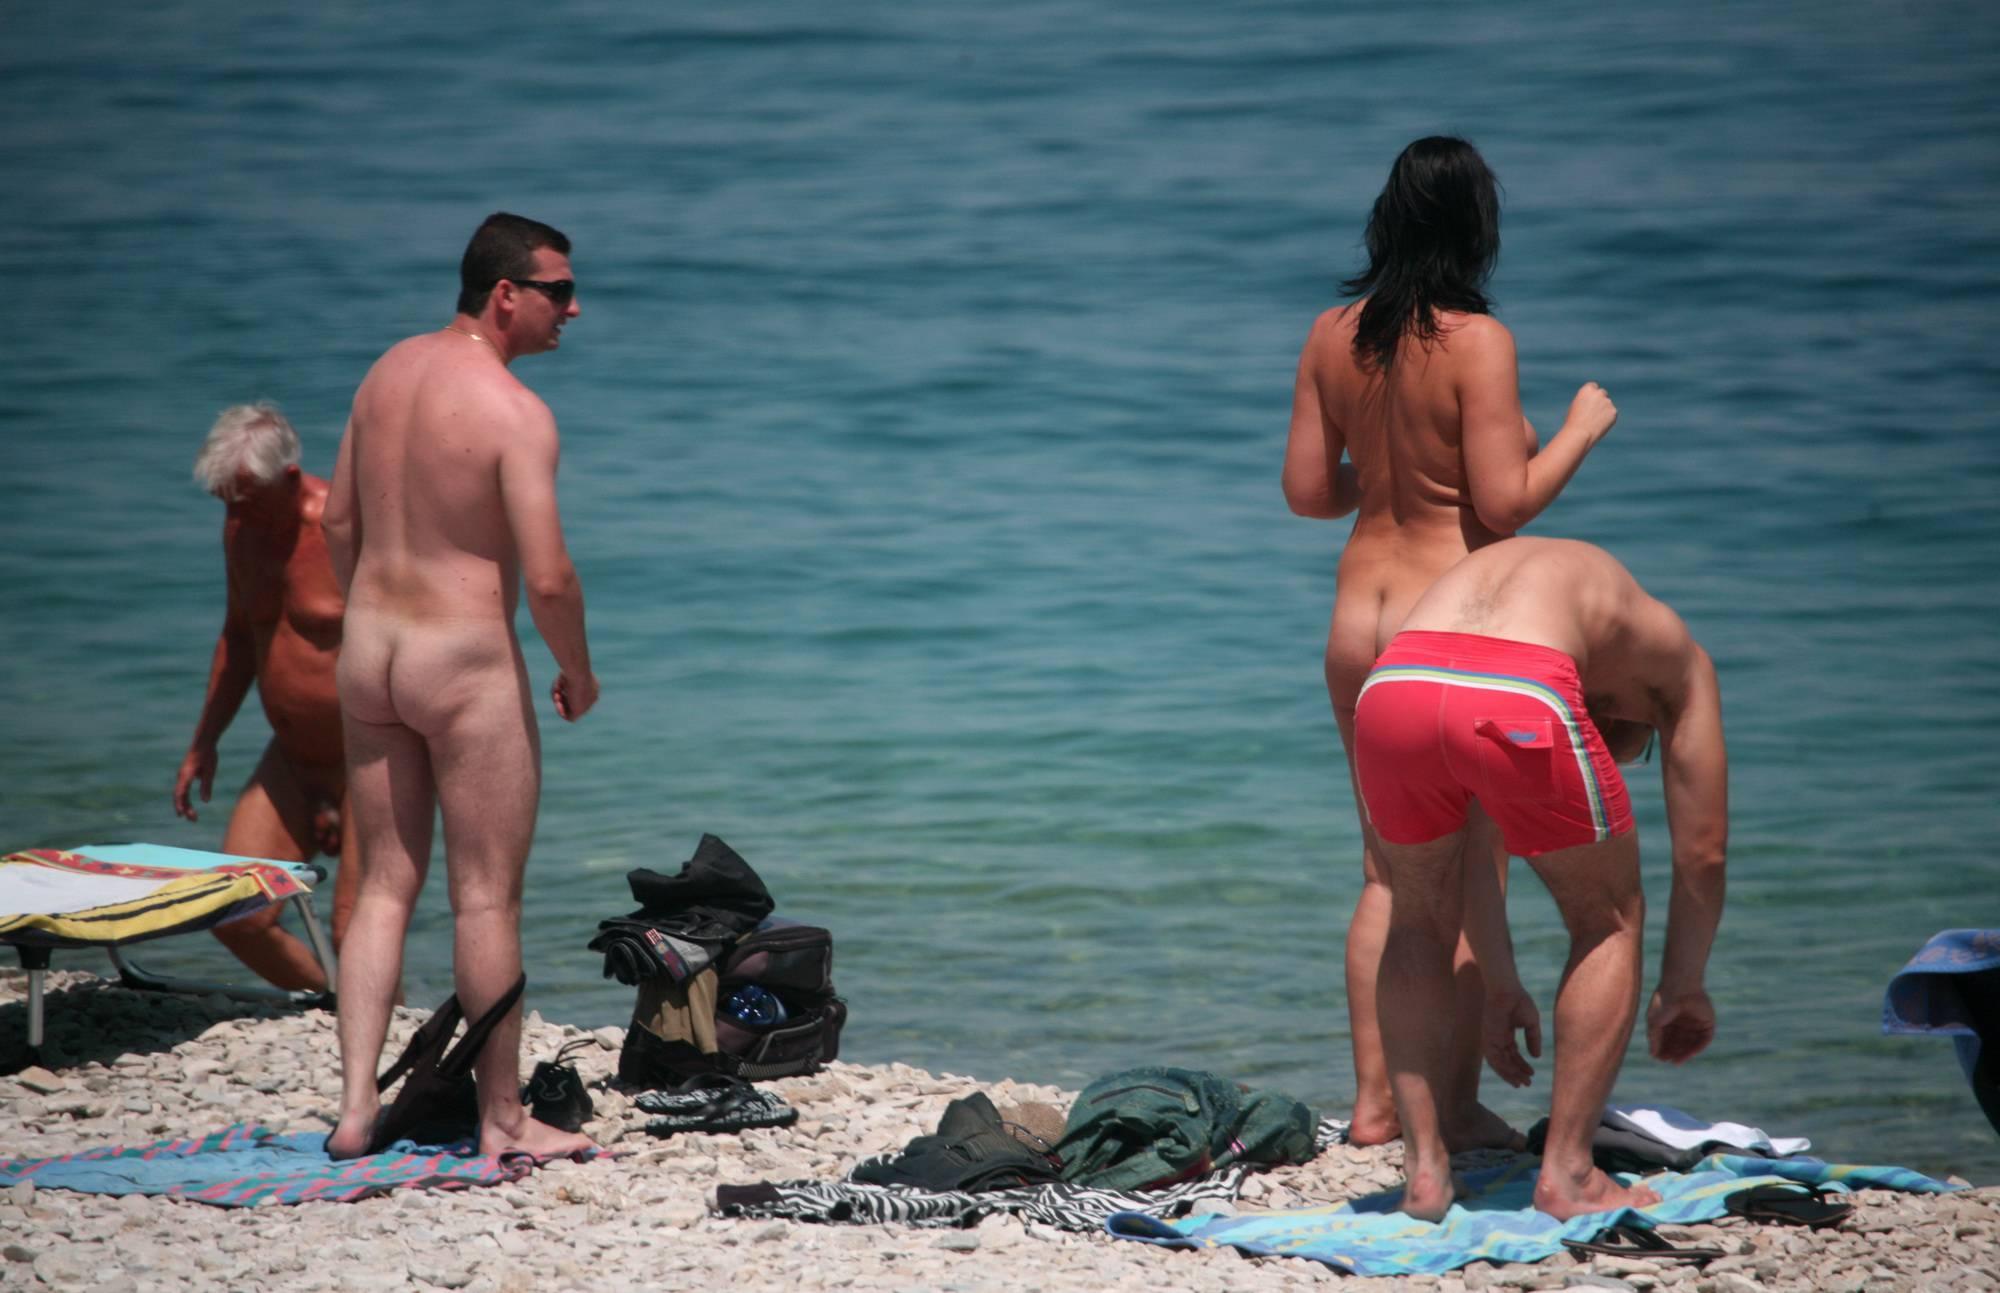 Friends Came on a Beach - 2